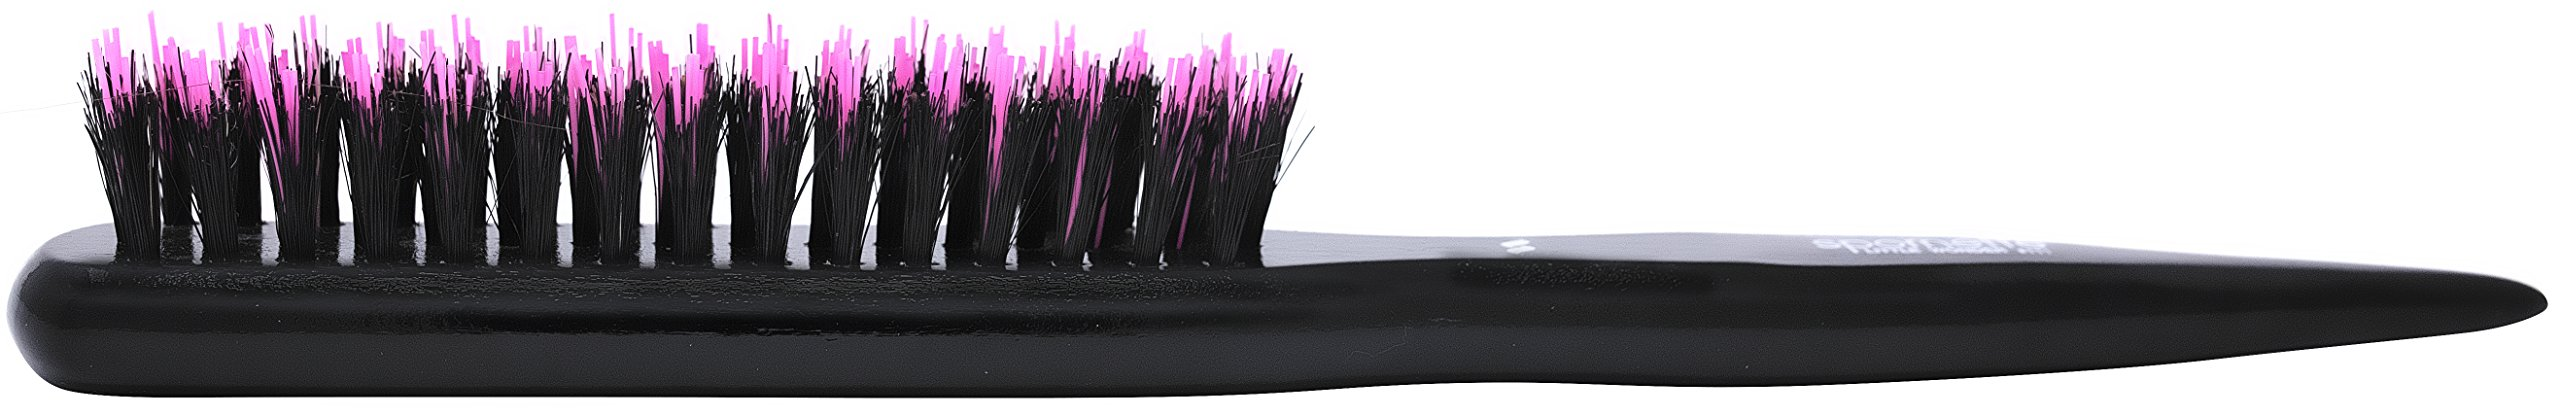 Spornette Little Wonder Boar & Tourmaline Nylon Bristle Teasing Brush (#111) with Tail Handle for Back Brushing, Back Combing, Creating Volume, Teasing, Slicking your hair back into a bun or ponytail